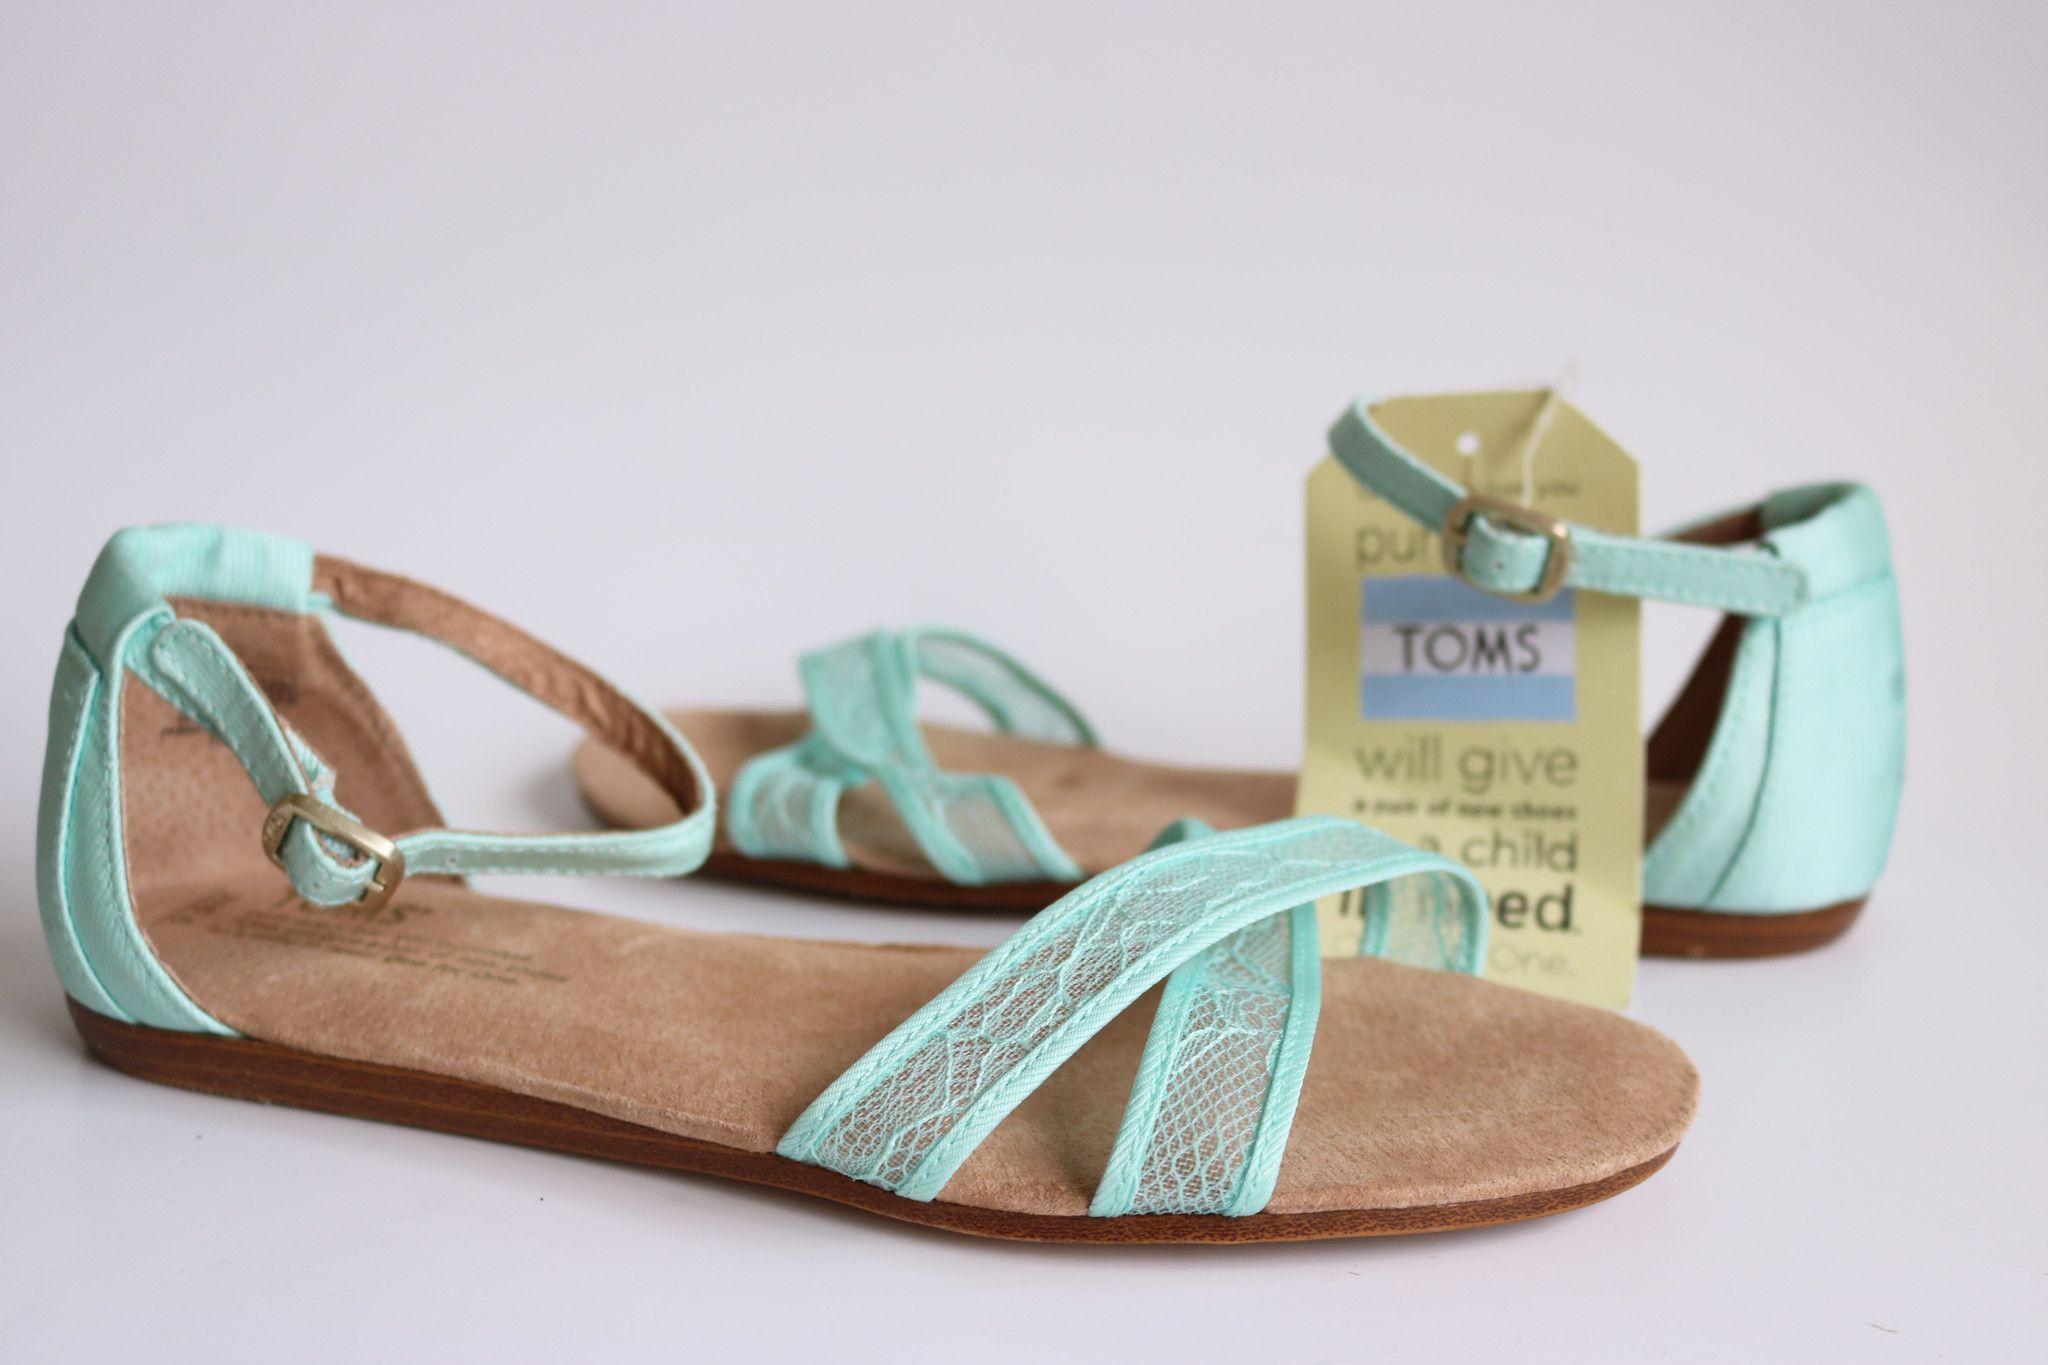 8d98eaa9986a TOMS Womens 301214 Light Blue Lace Correa Satin Ankle Strap Dress Sandals  Size 6.5